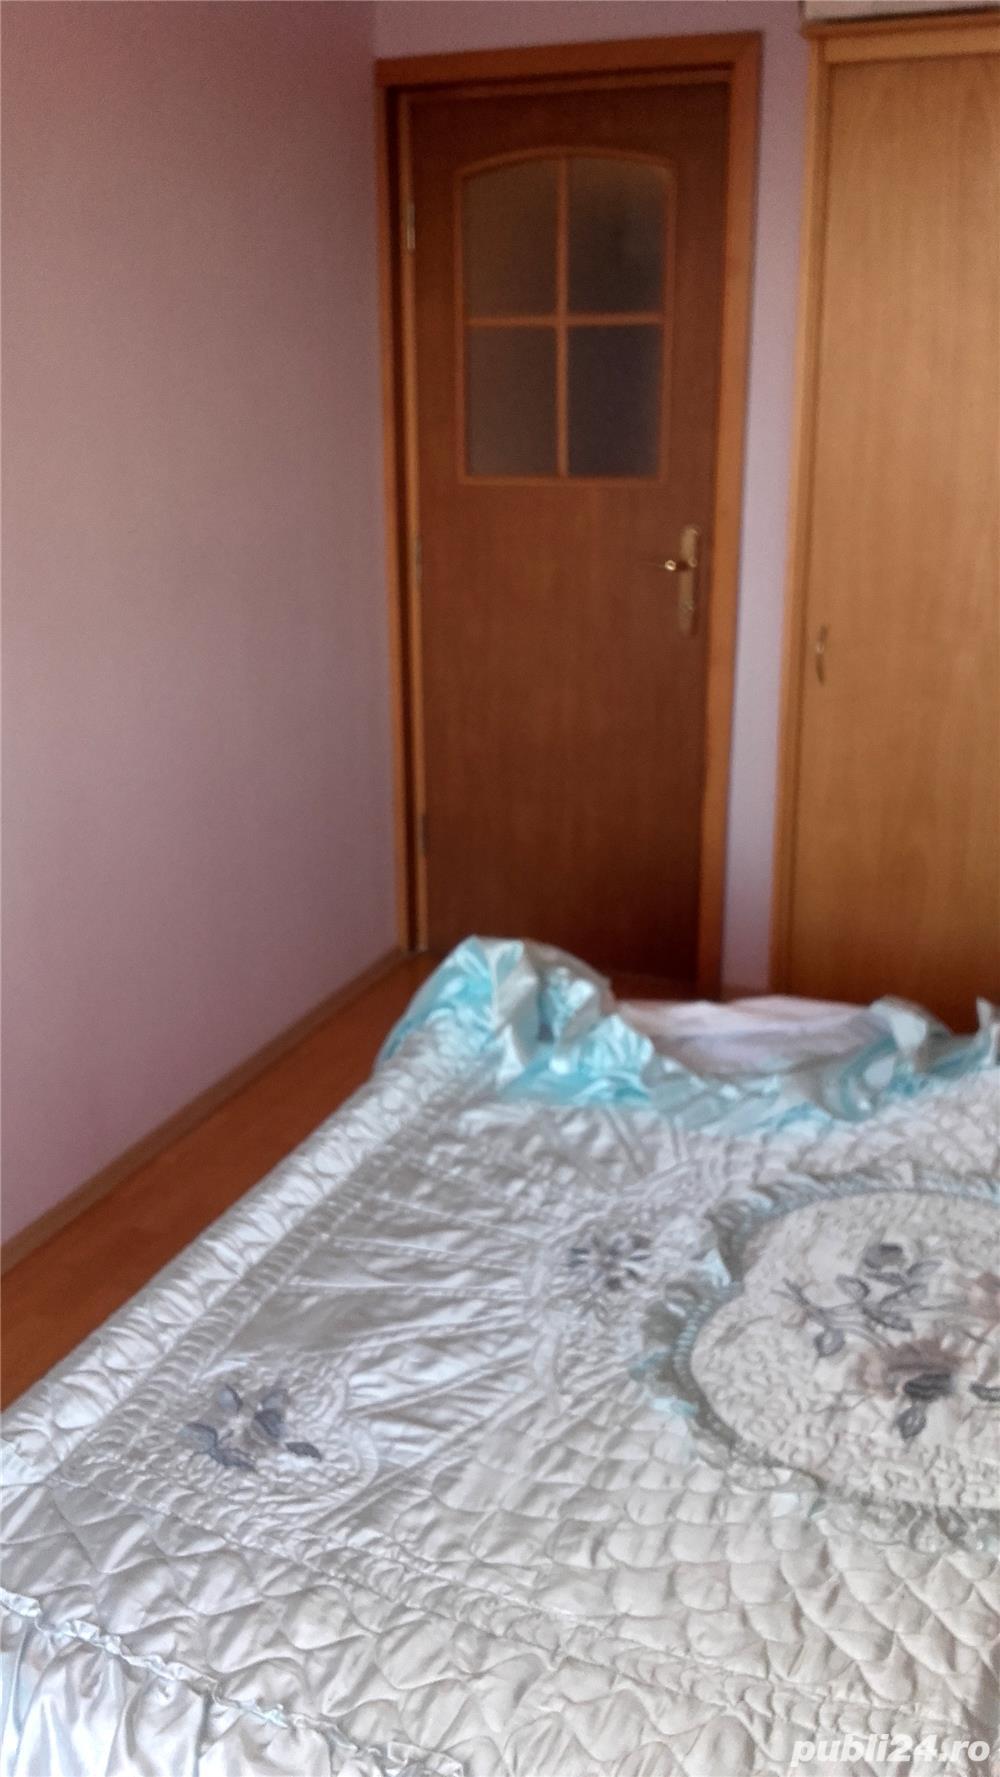 Vand apartament 4 camere, Bucuresti, sector 4 , Berceni, zona Aparatorii Patriei - Oltenitei